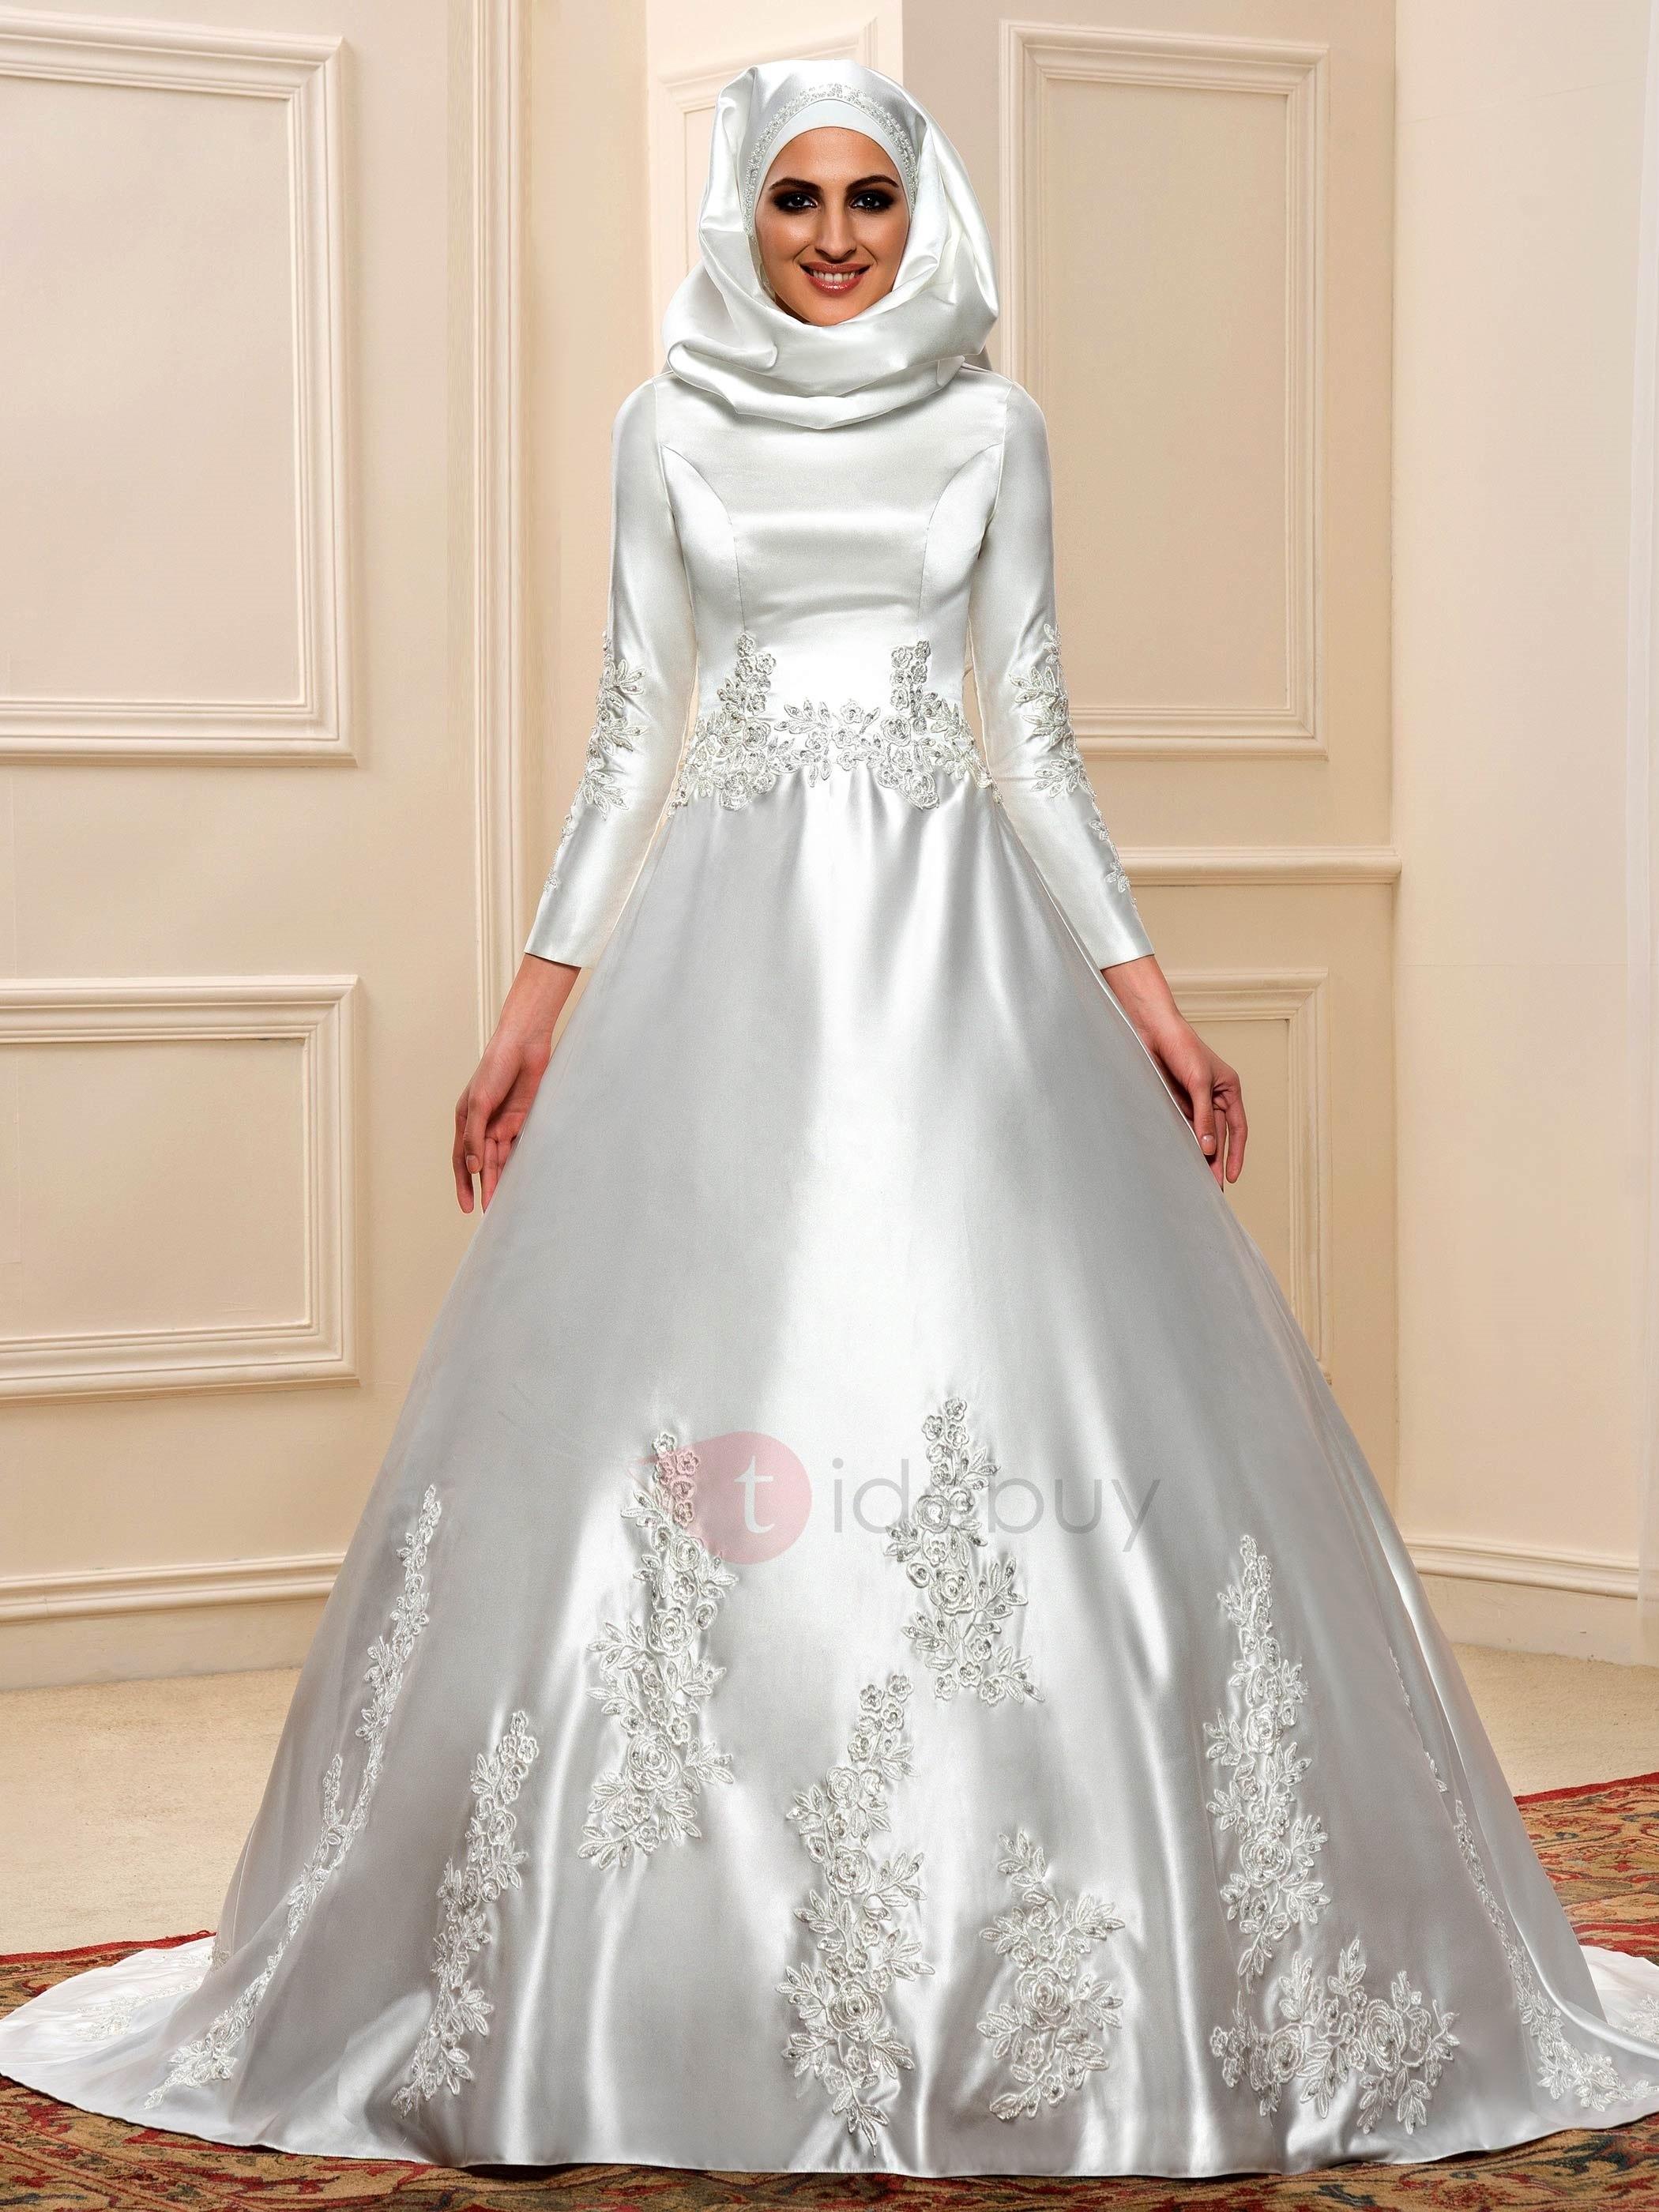 بالصور صور فساتين زواج , اجمل فستان فرح لاجمل عروسة 1070 3